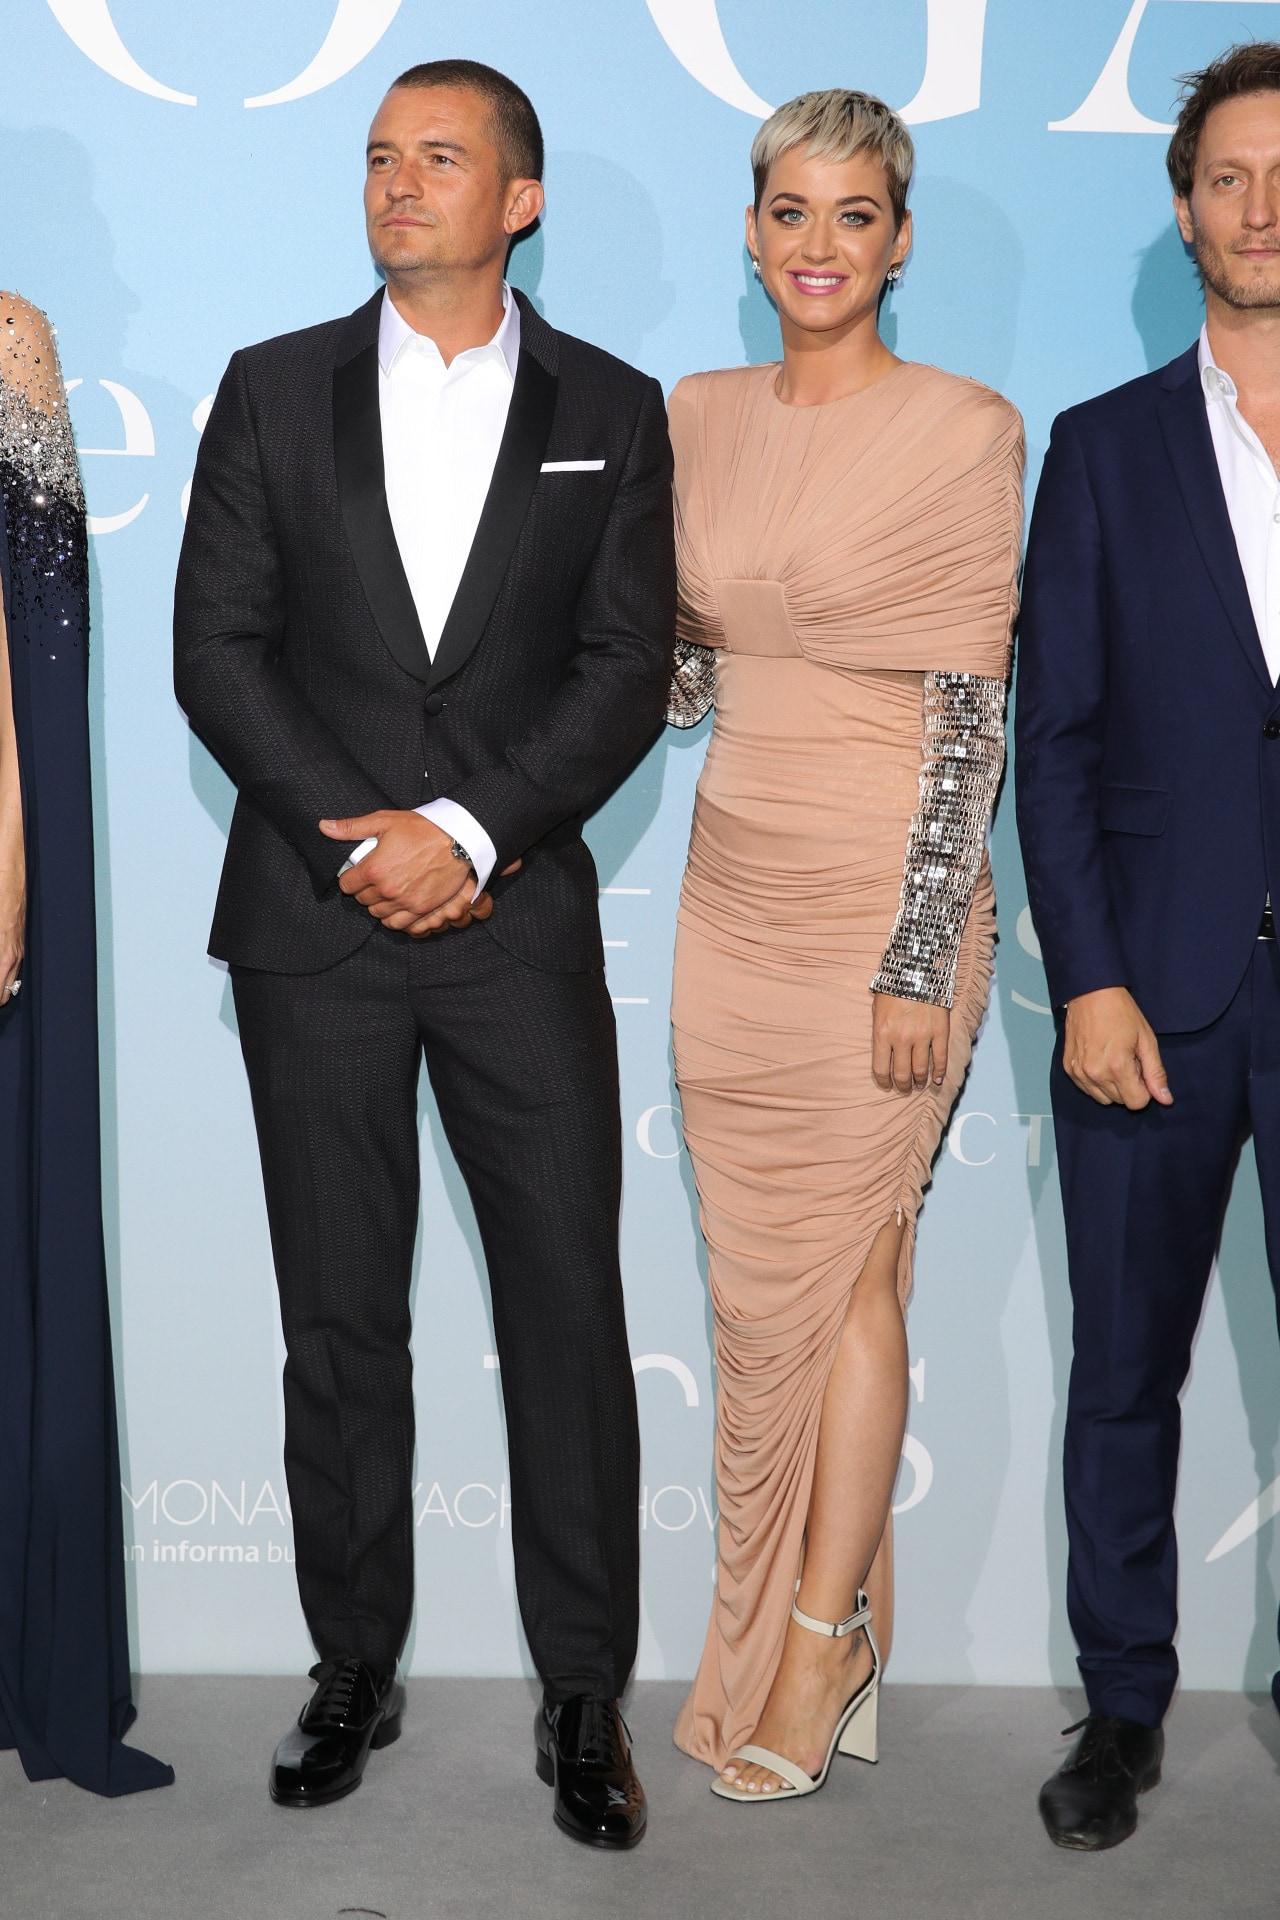 Orlando Bloom and Katy Perry in Monaco. Image credit: AFP